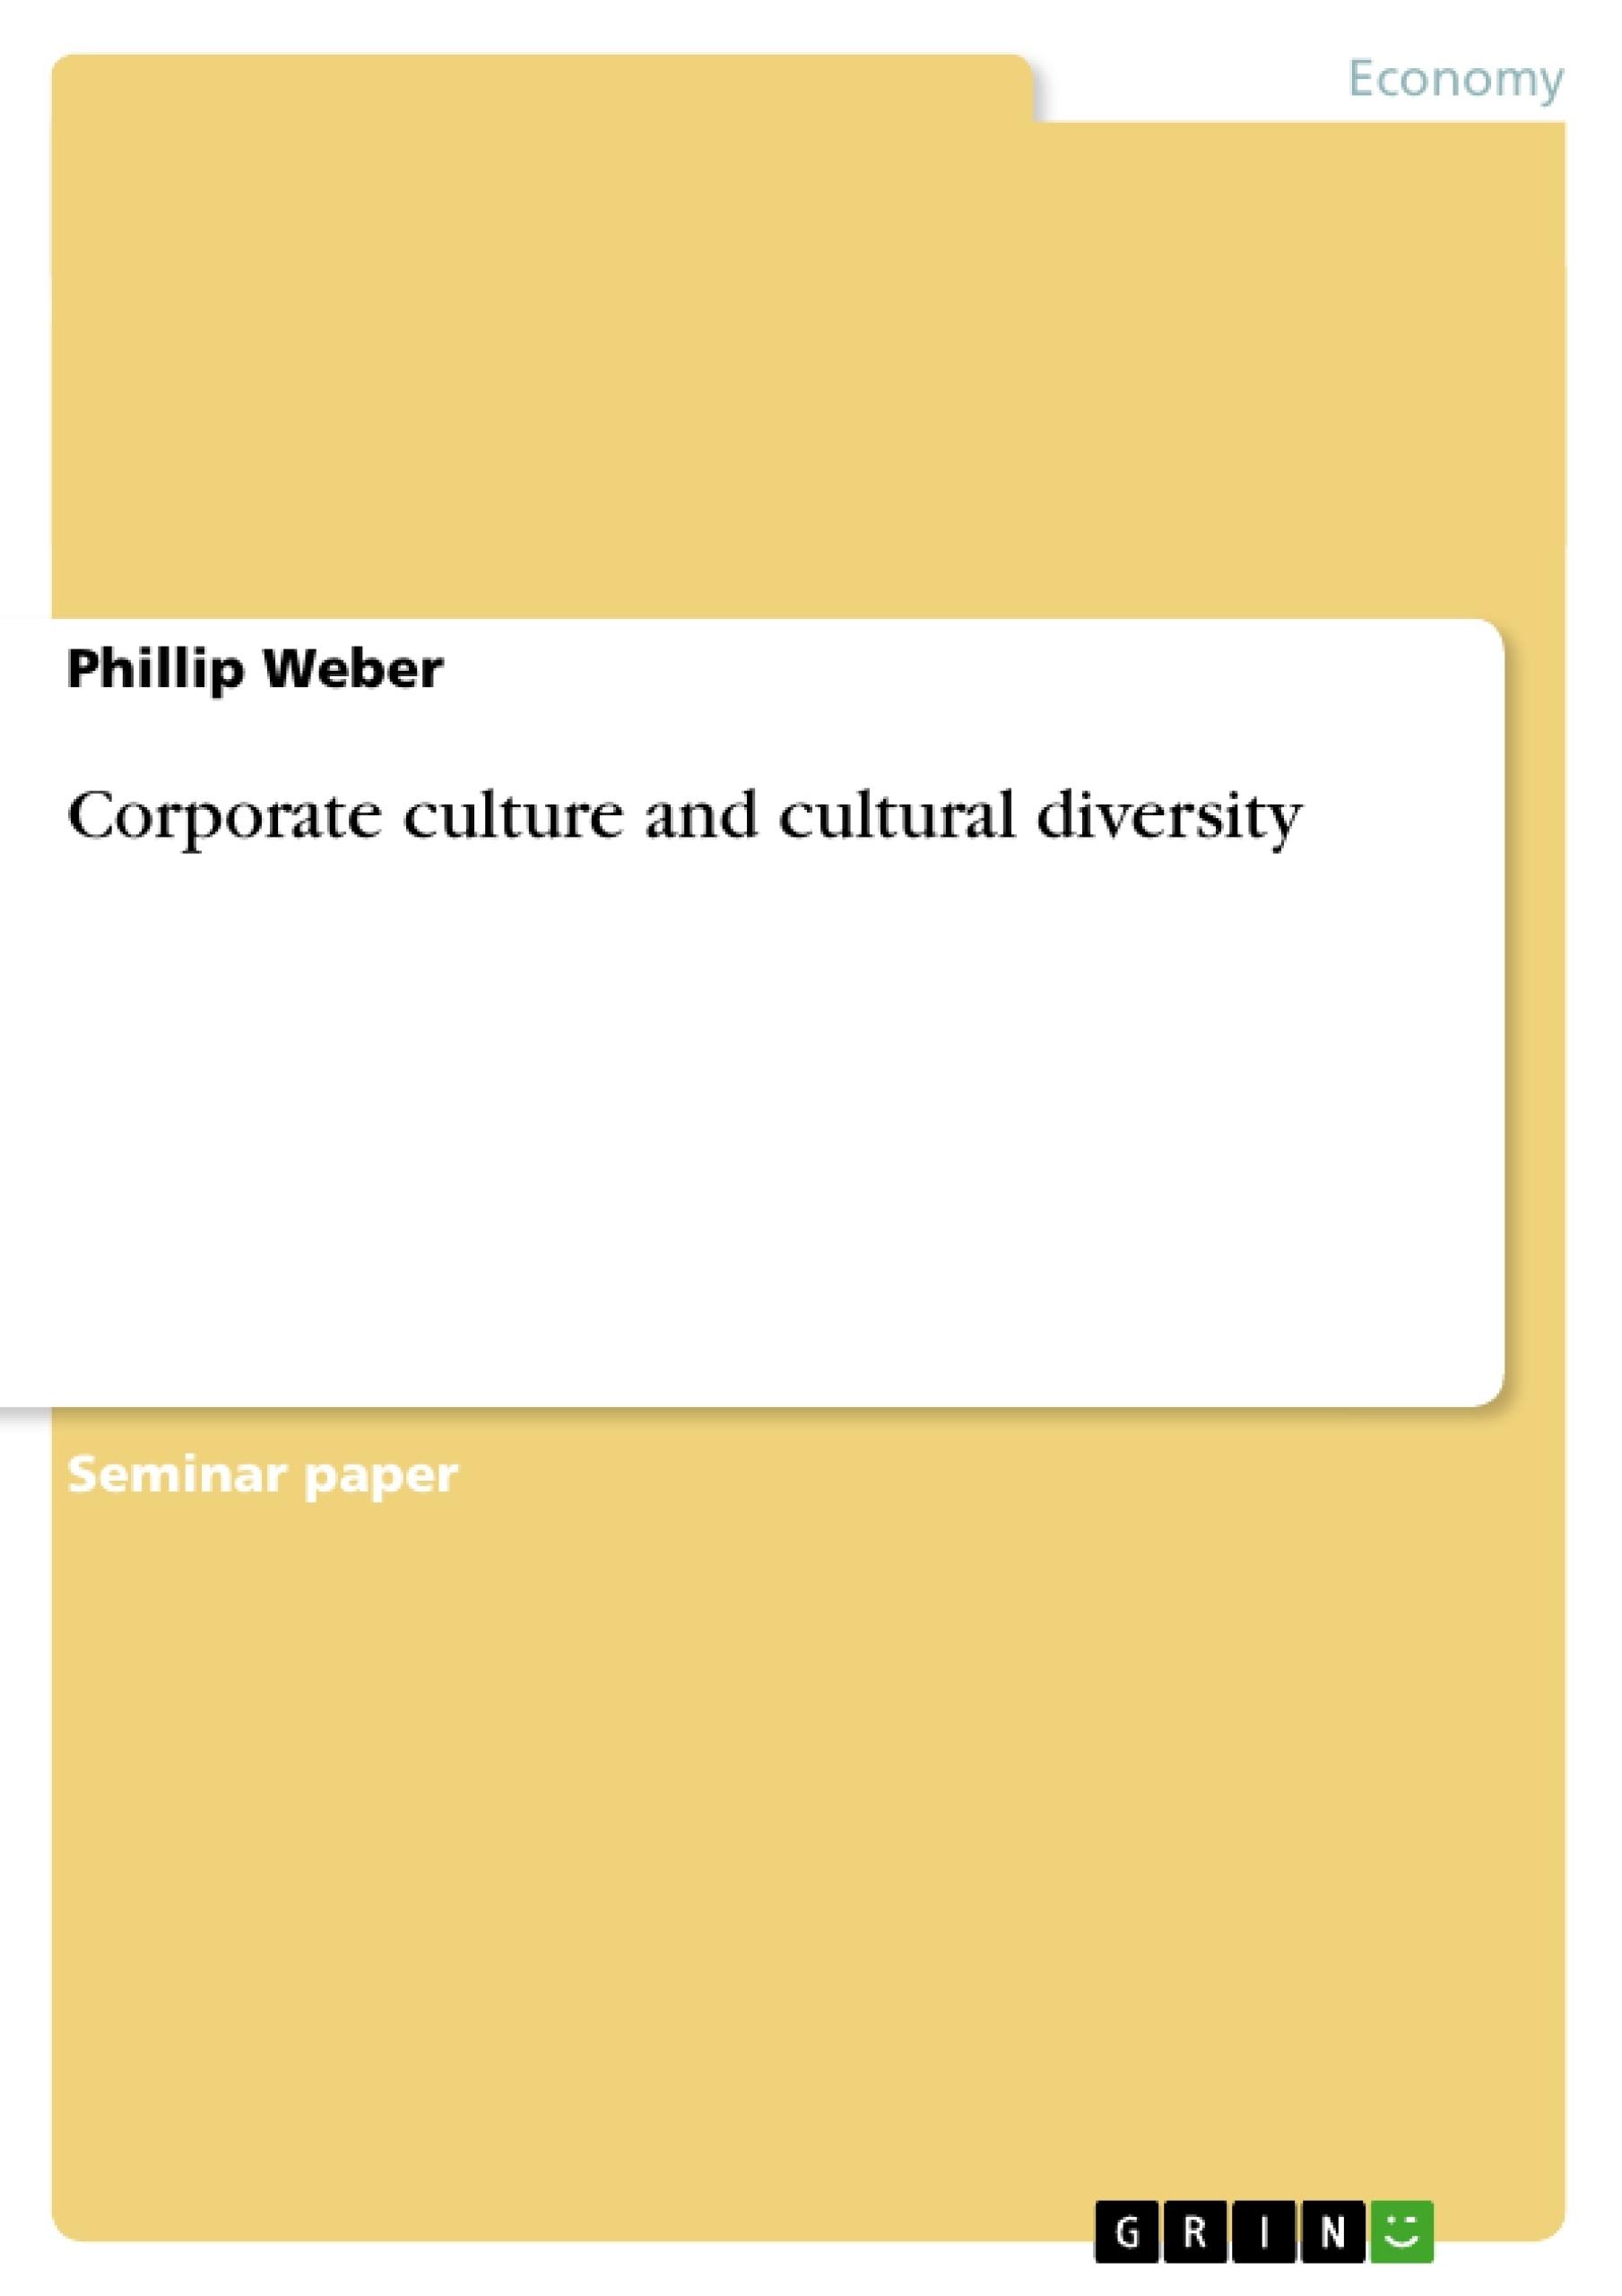 Title: Corporate culture and cultural diversity